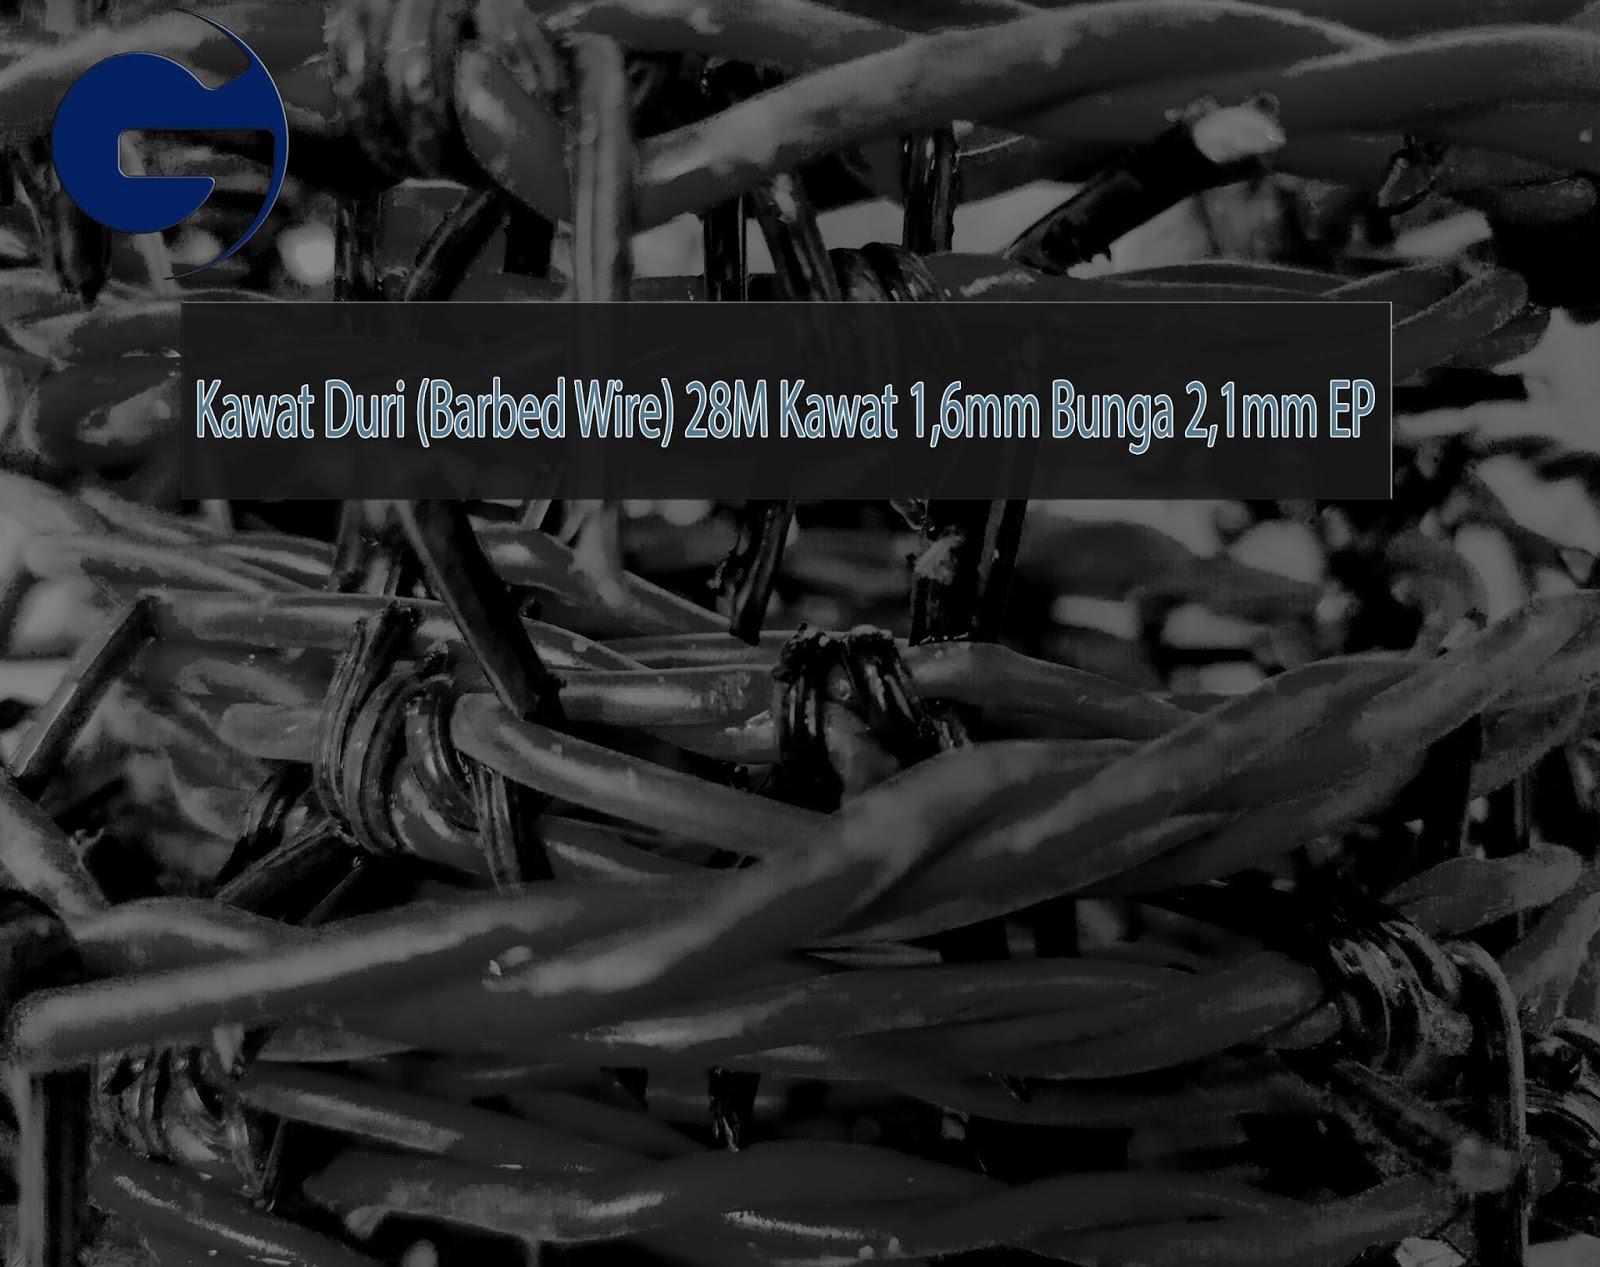 Jual Kawat Duri SNI 28M Kawat 1,6mm bunga 2,1mm EP